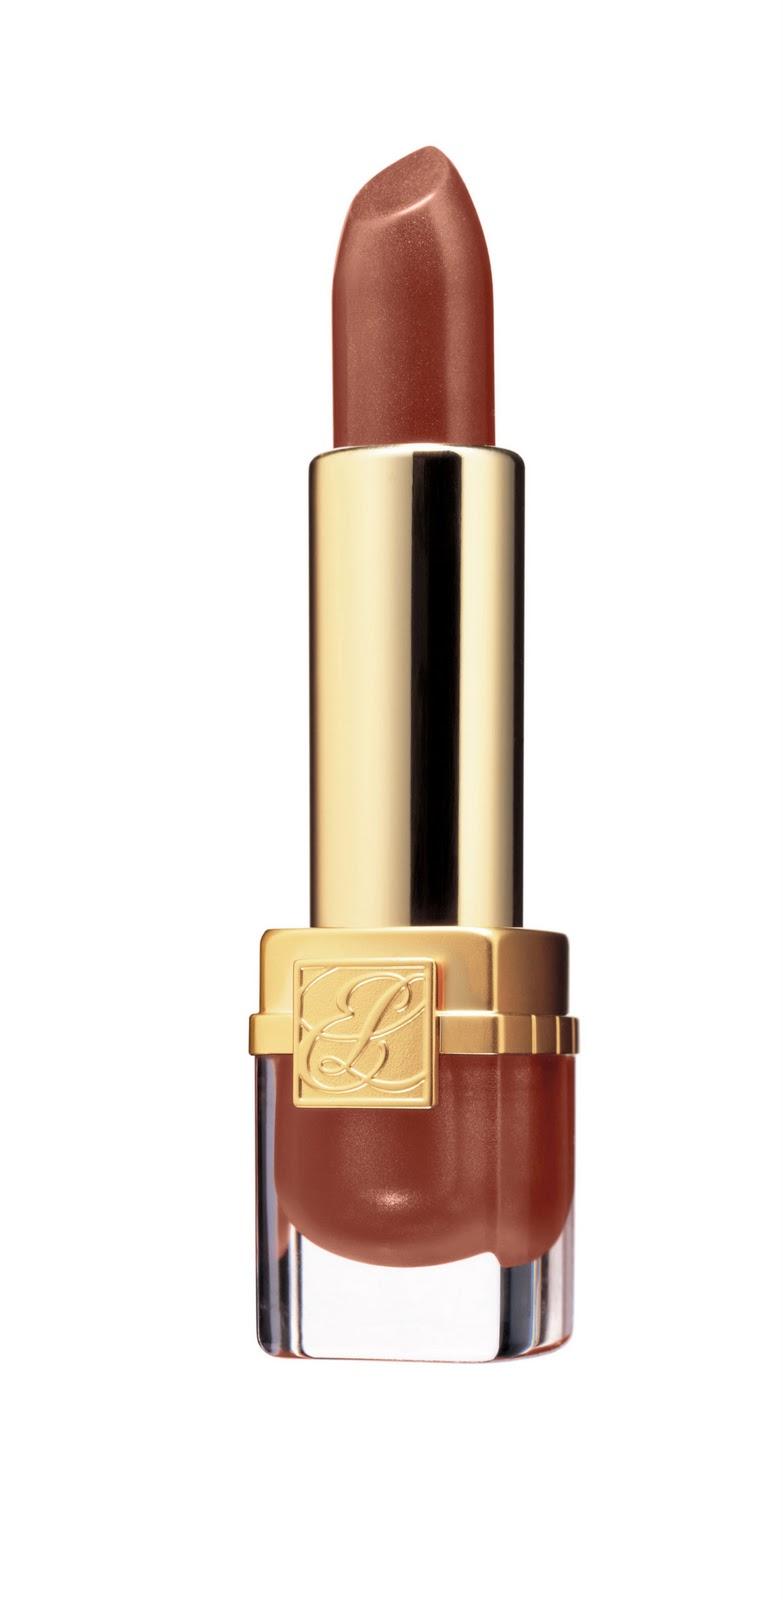 Lipstick: Estee Lauder New Pure Color Lipstick By Tom Pecheux: 35